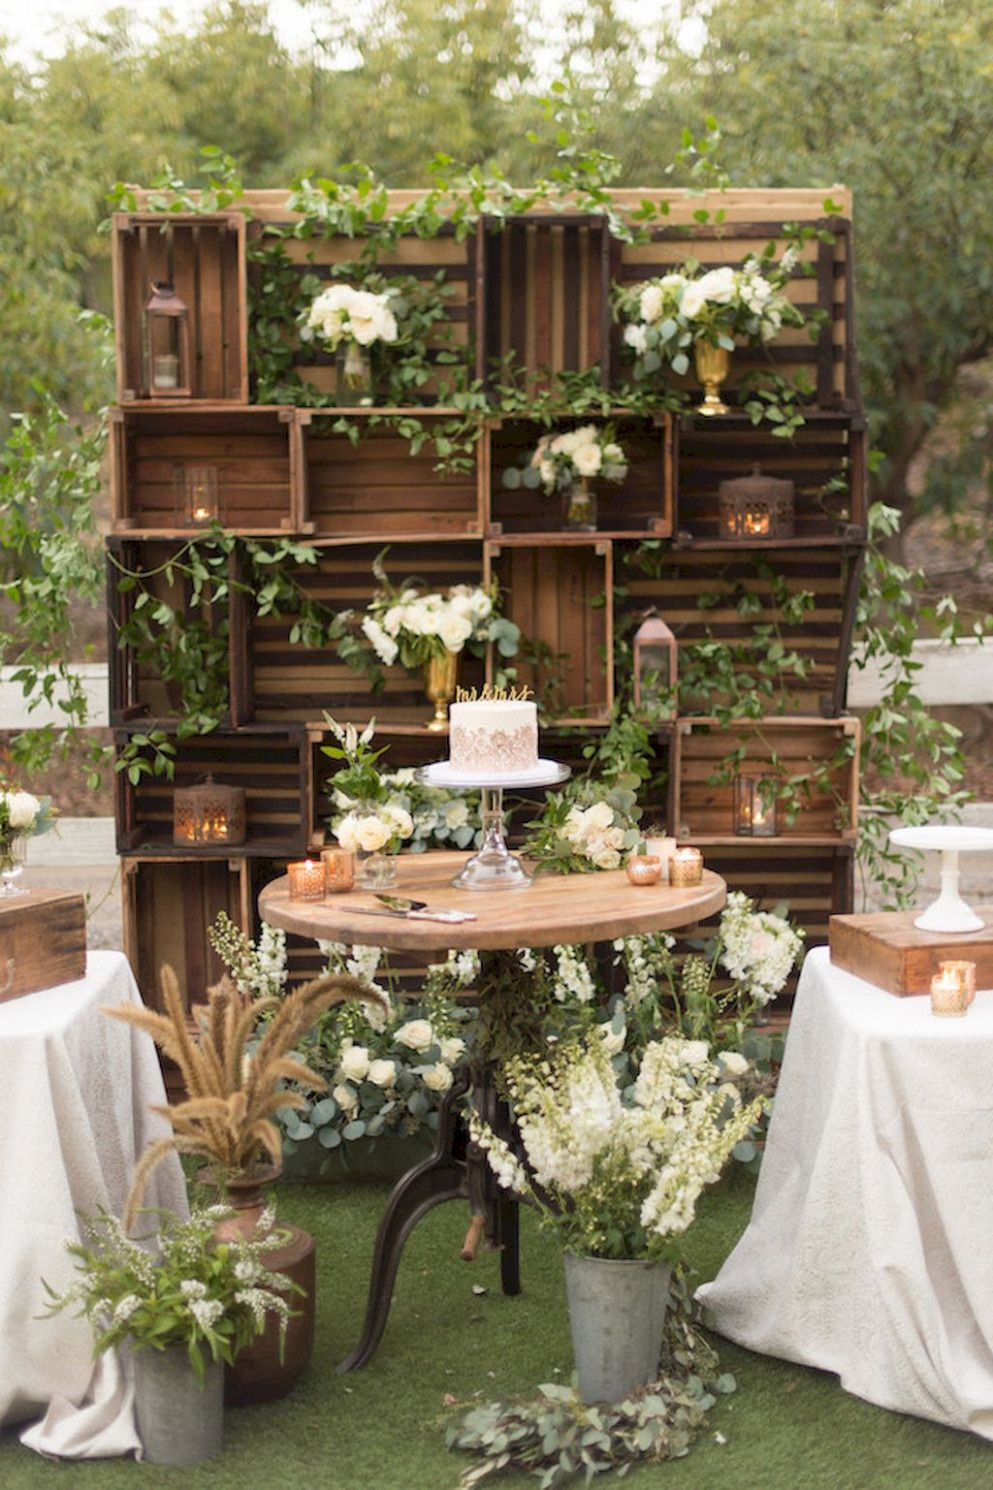 Outdoor Wedding Ideas On A Budget Outdoor wedding